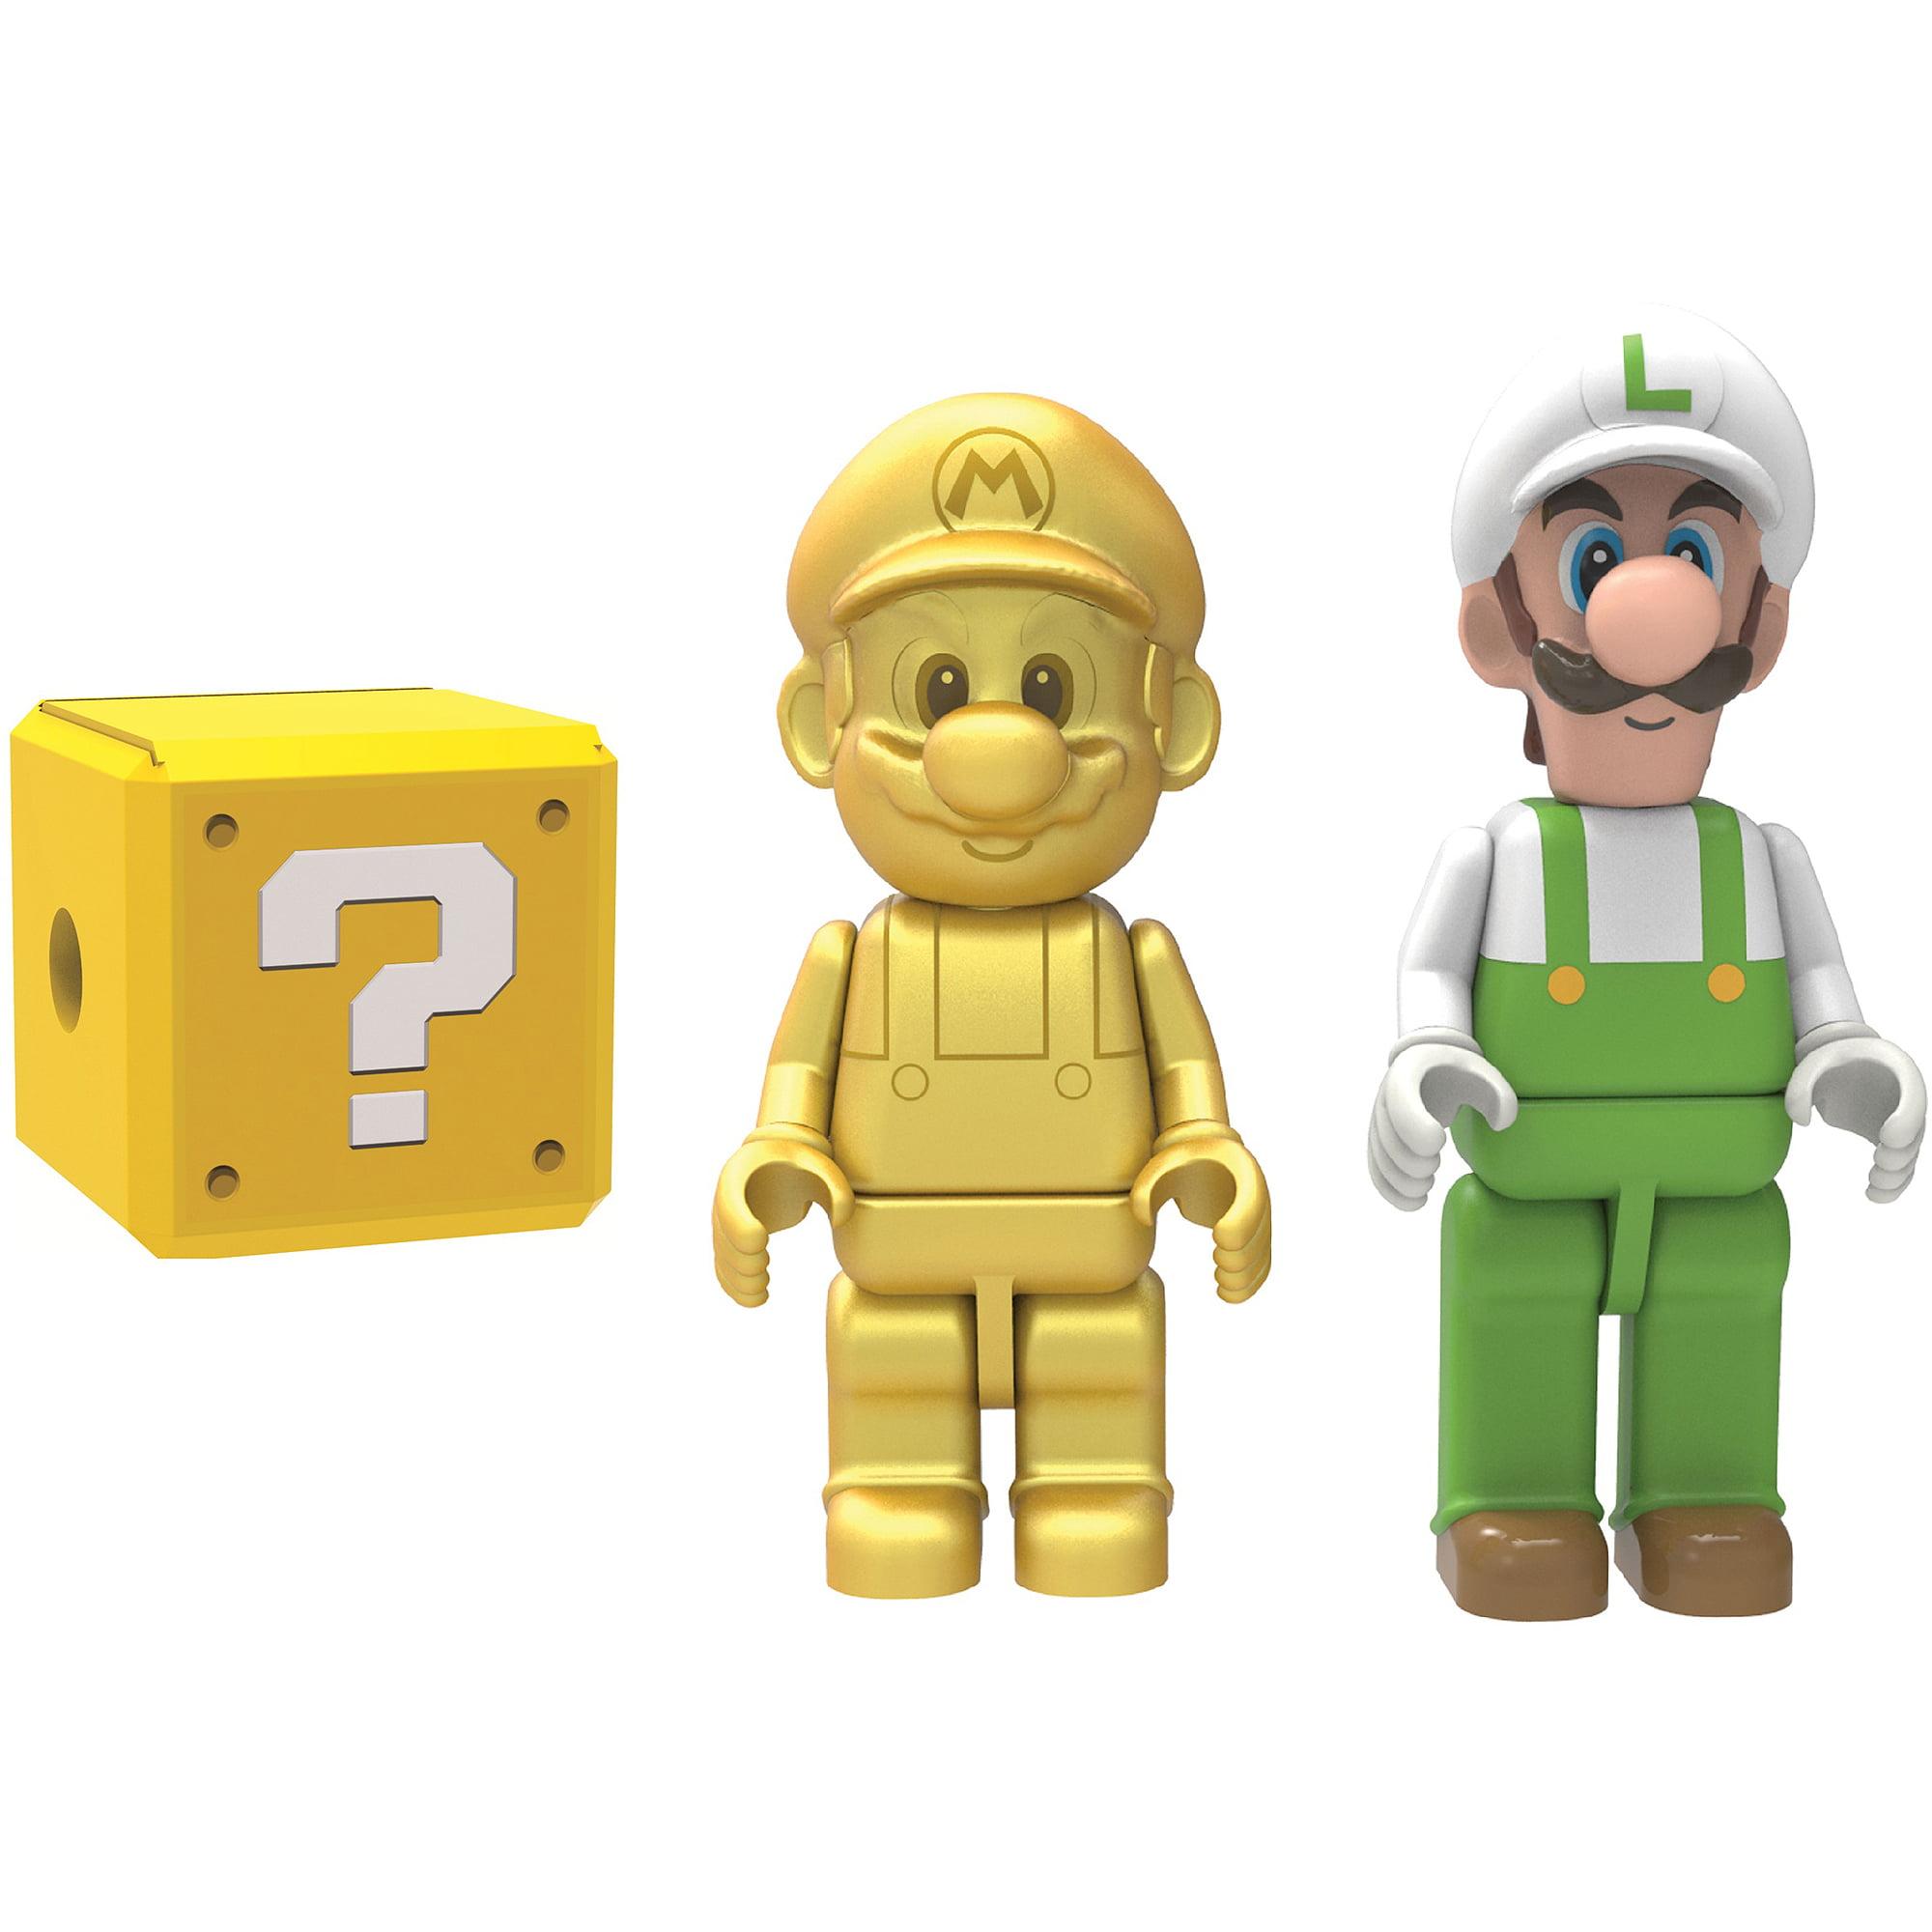 K'NEX Super Mario Golden Mario, Fire Luigi and Mystery Figure, 3-Pack